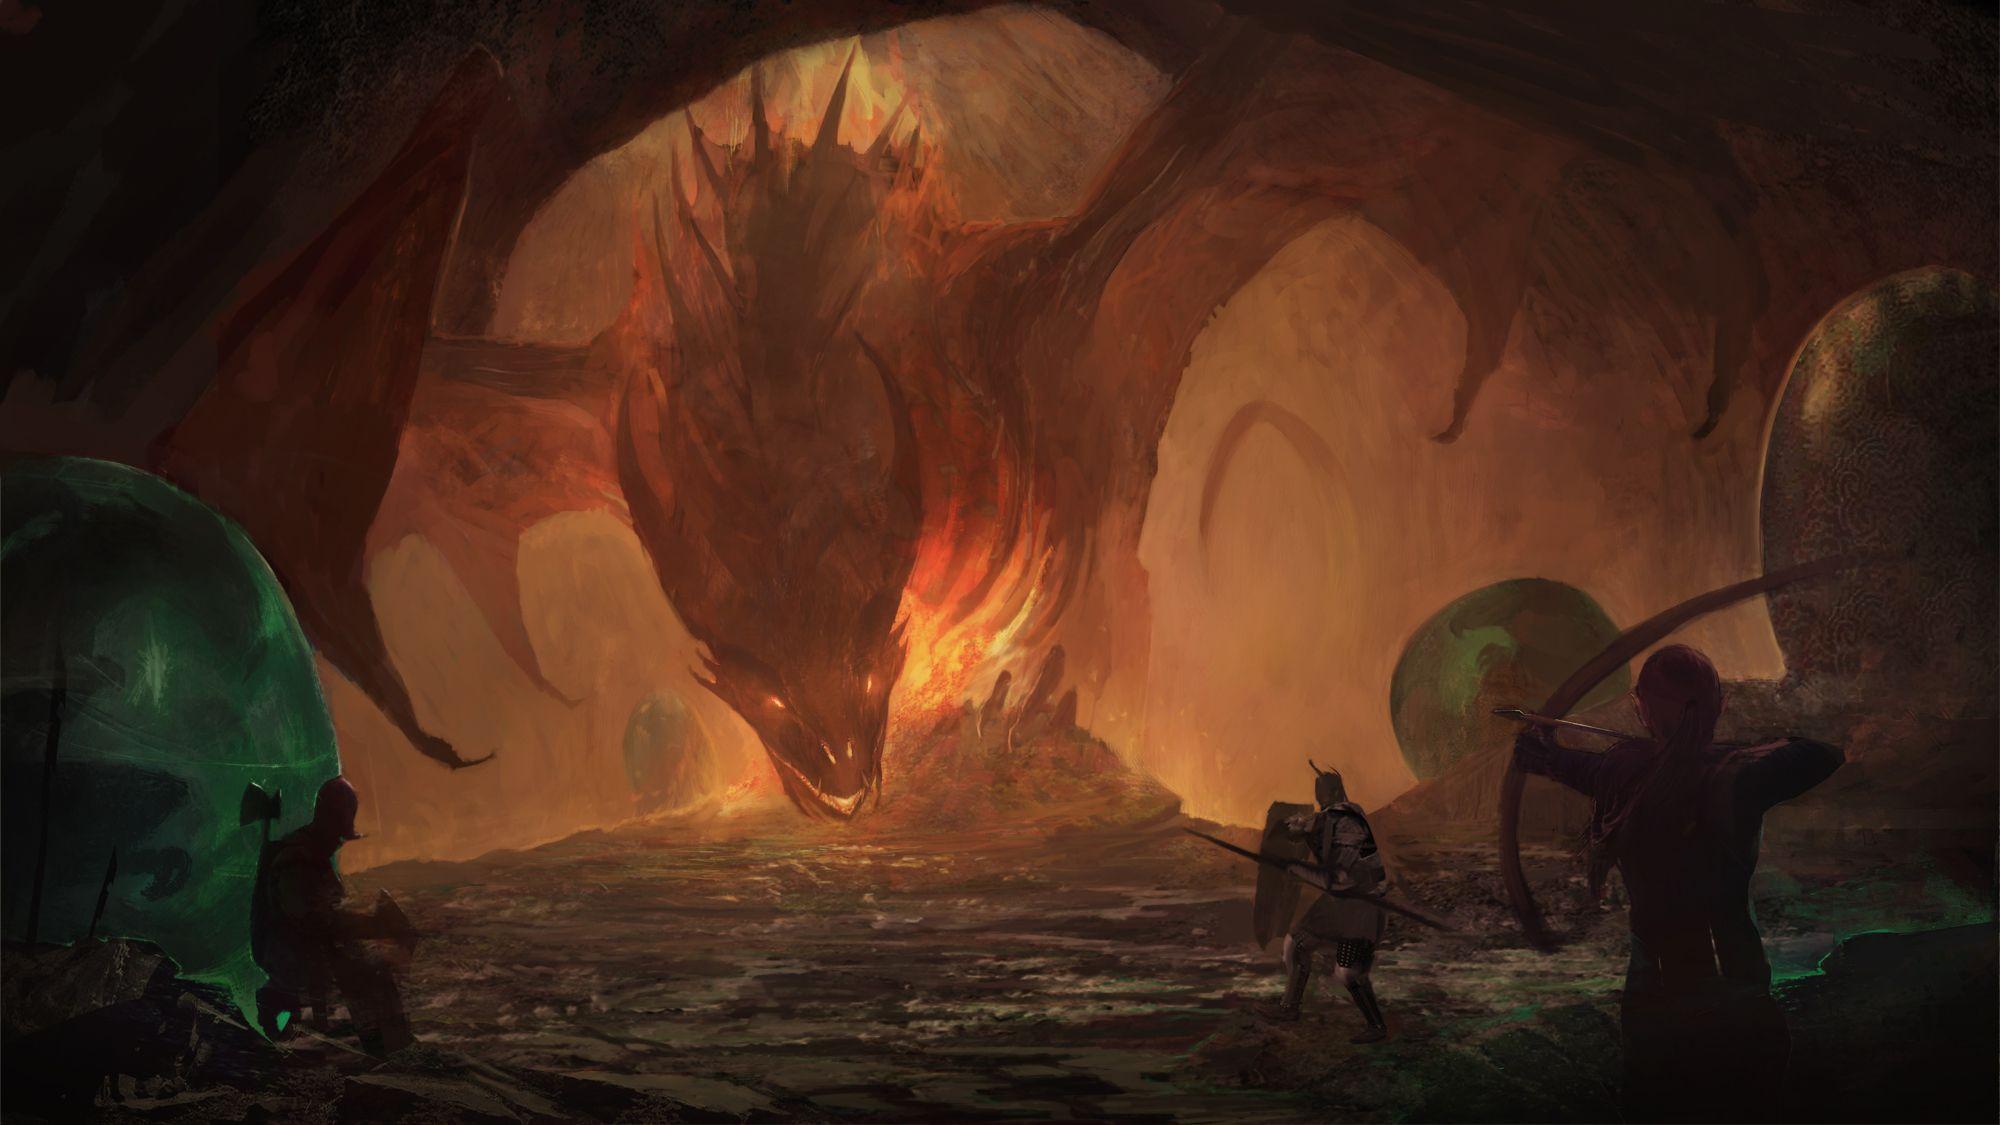 Dragon #drago #Dragons #draghi #wing #ala #wings #ali #tail